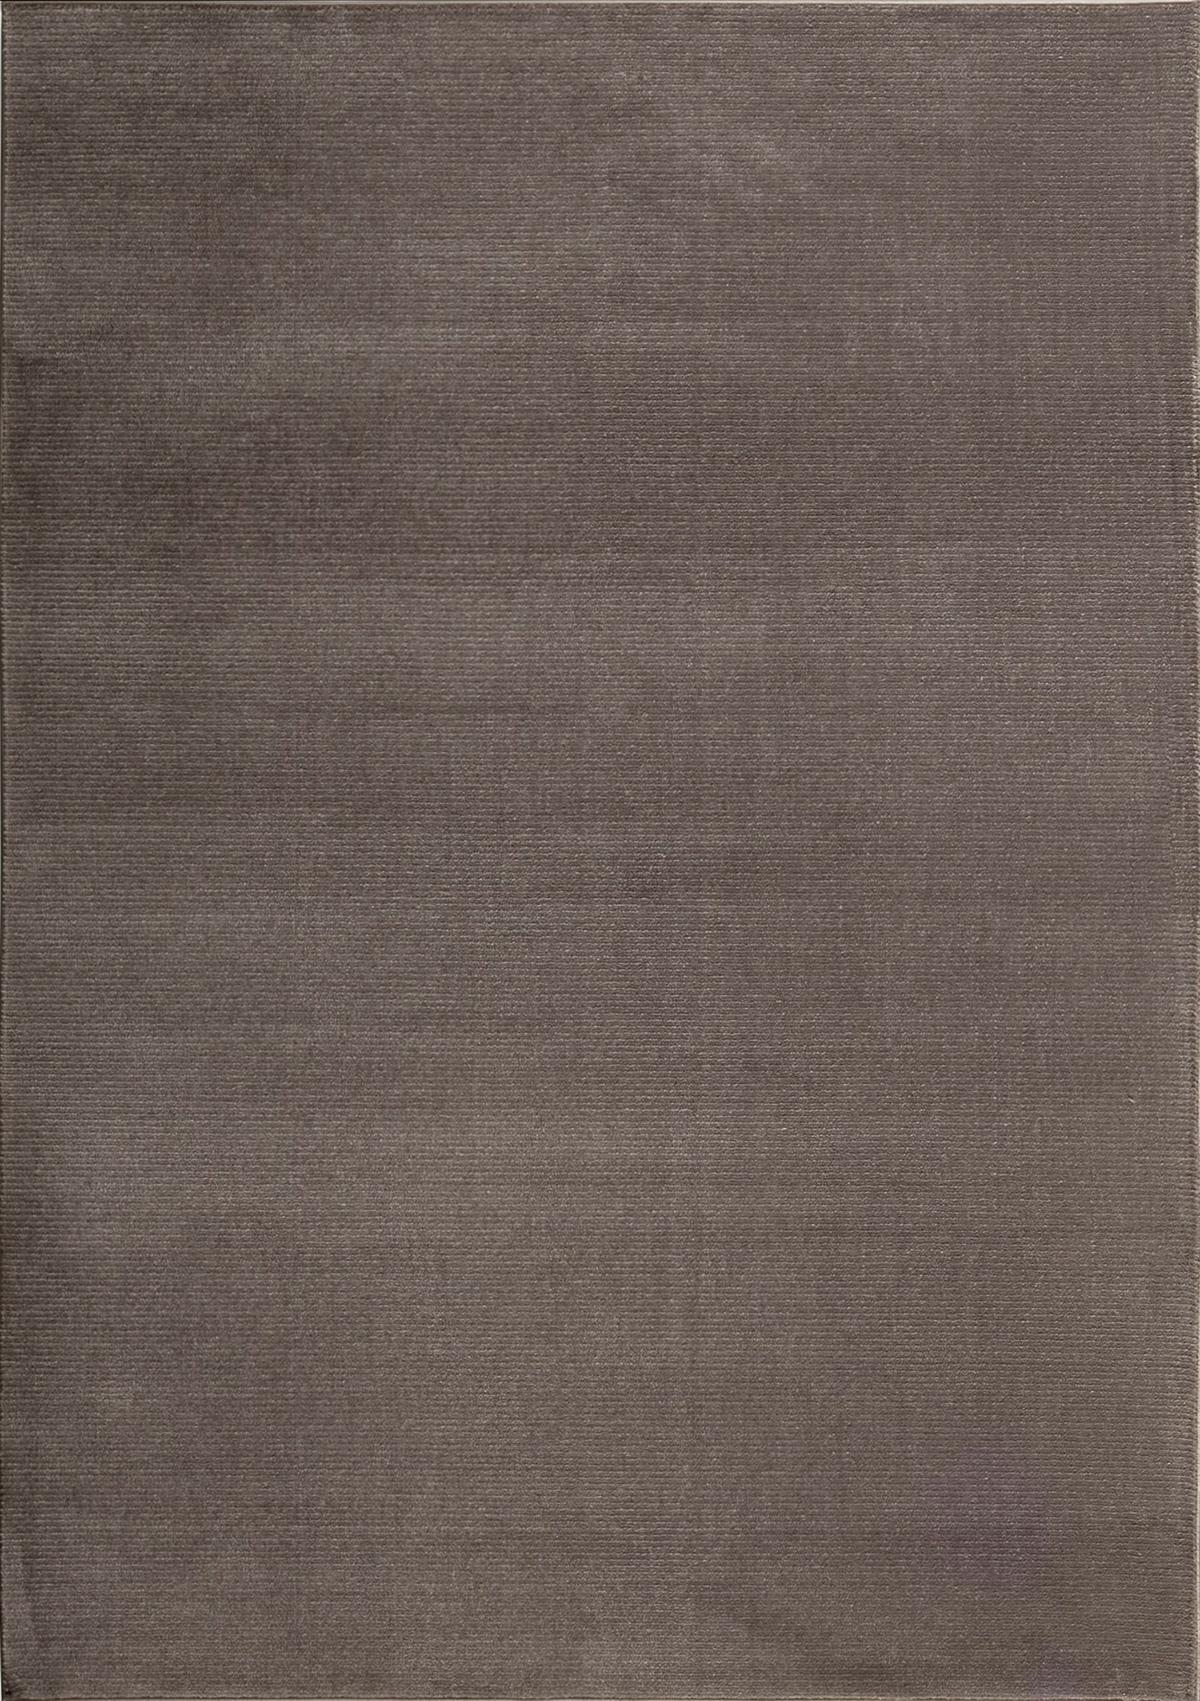 Tapis moderne uni doux taupe 160x230